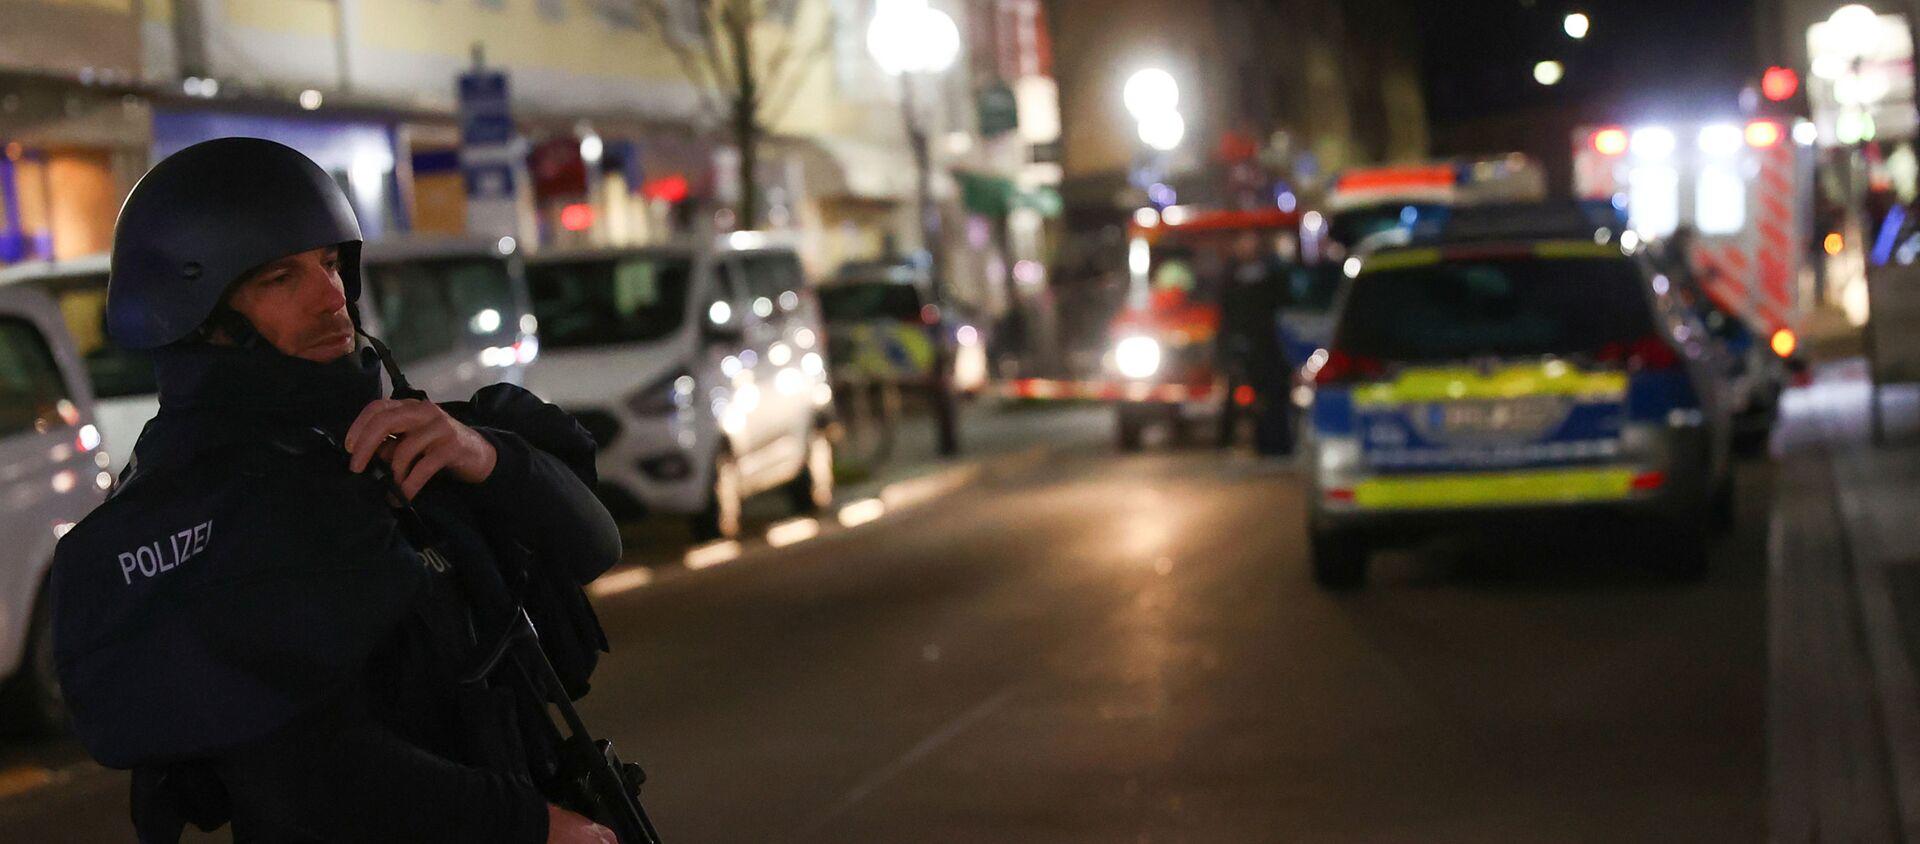 A police officer secures the area after a shooting in Hanau near Frankfurt, Germany, February 19, 2020 - Sputnik International, 1920, 19.02.2020